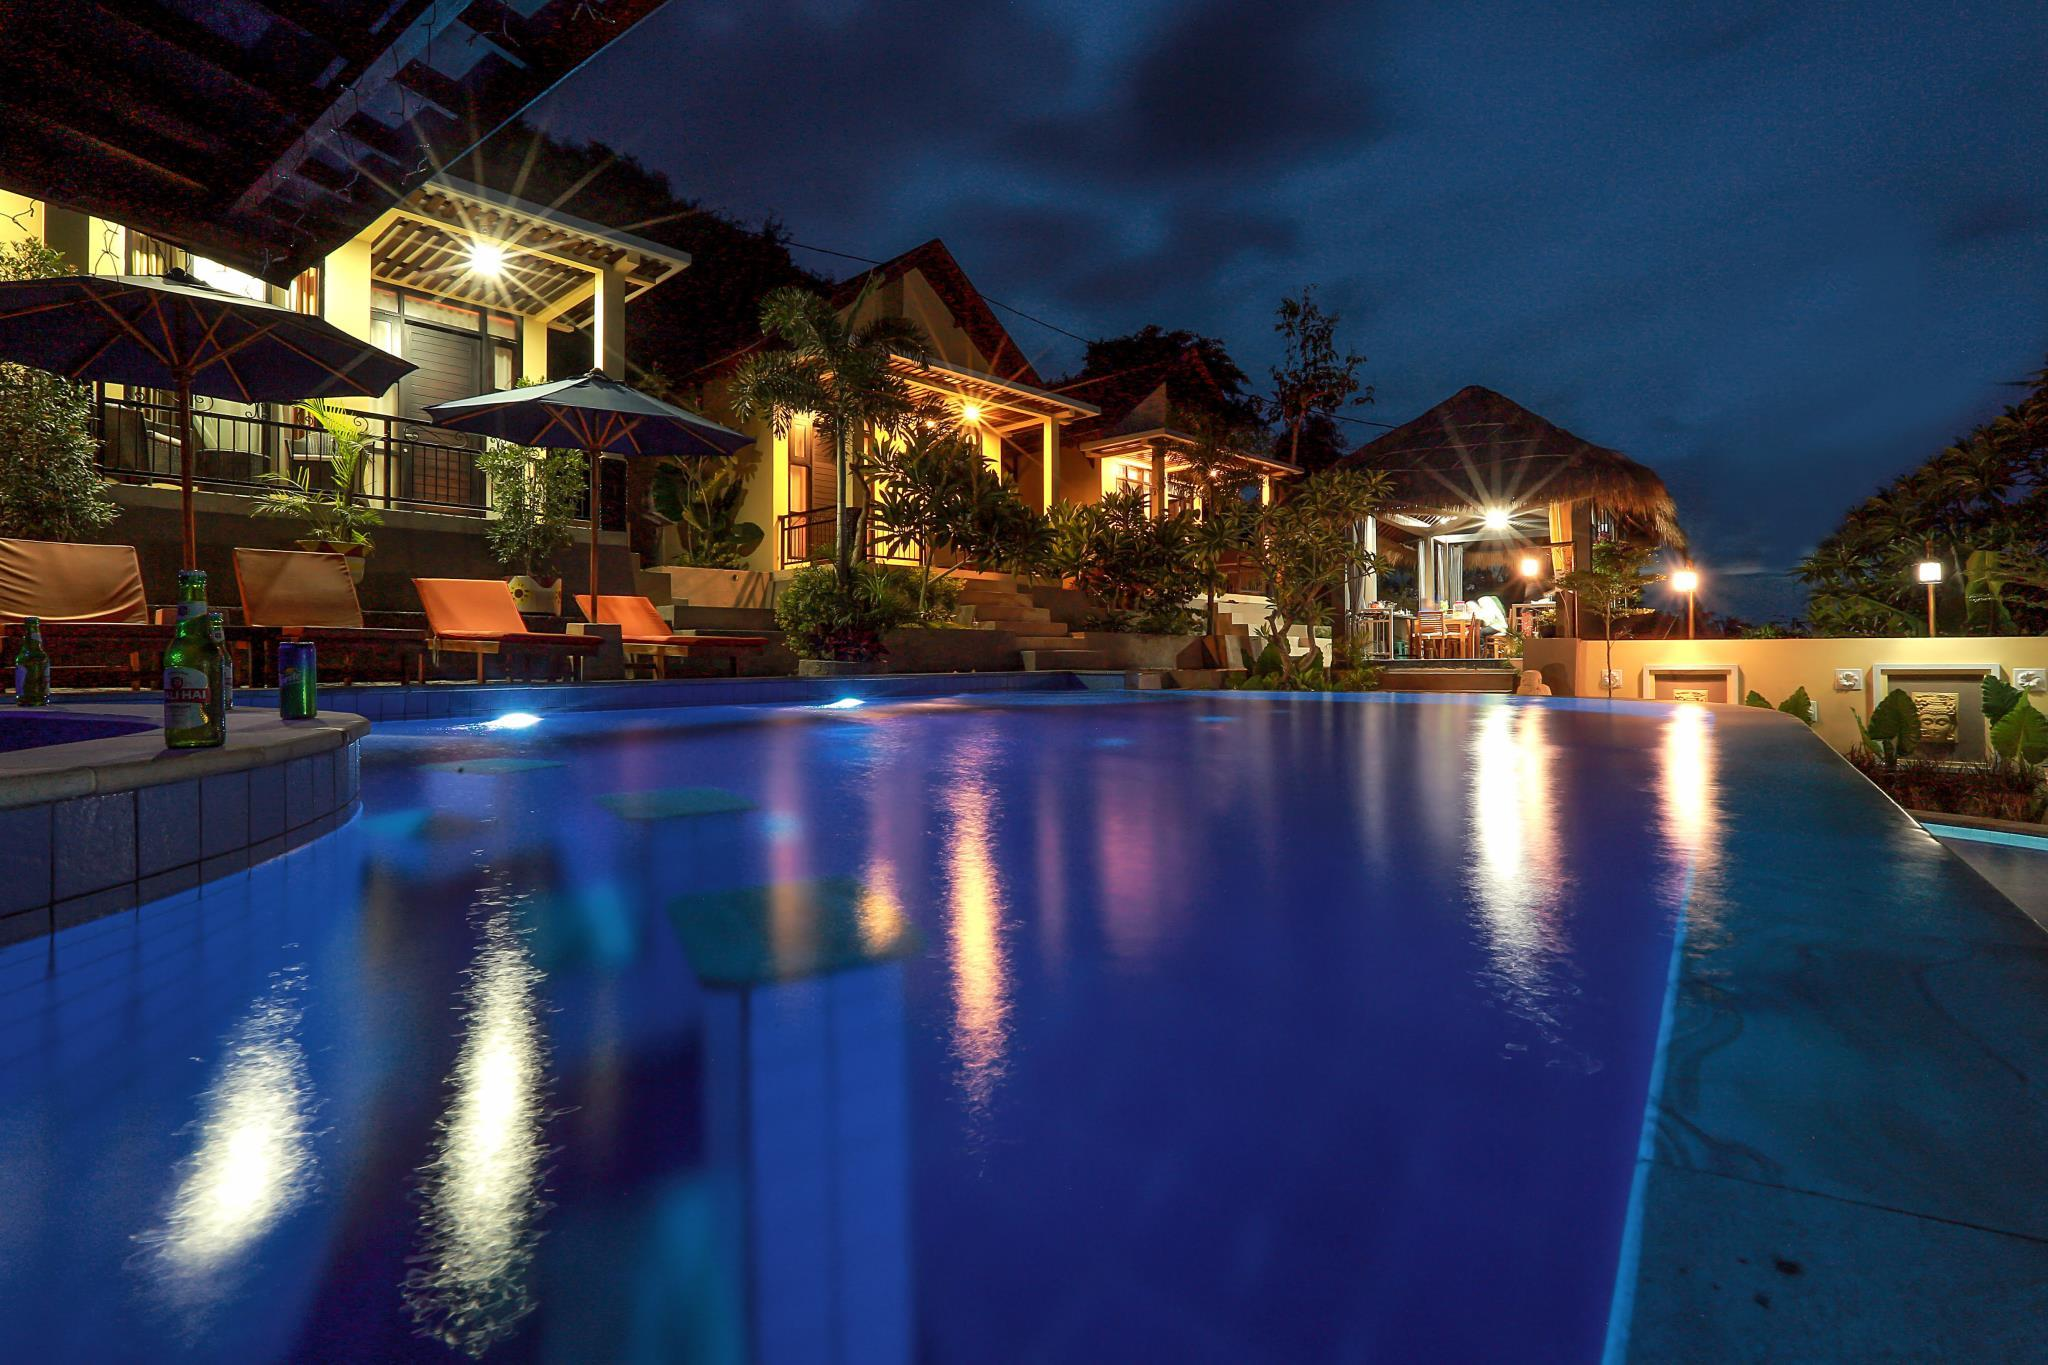 Nipah Pool Villas And Restaurant